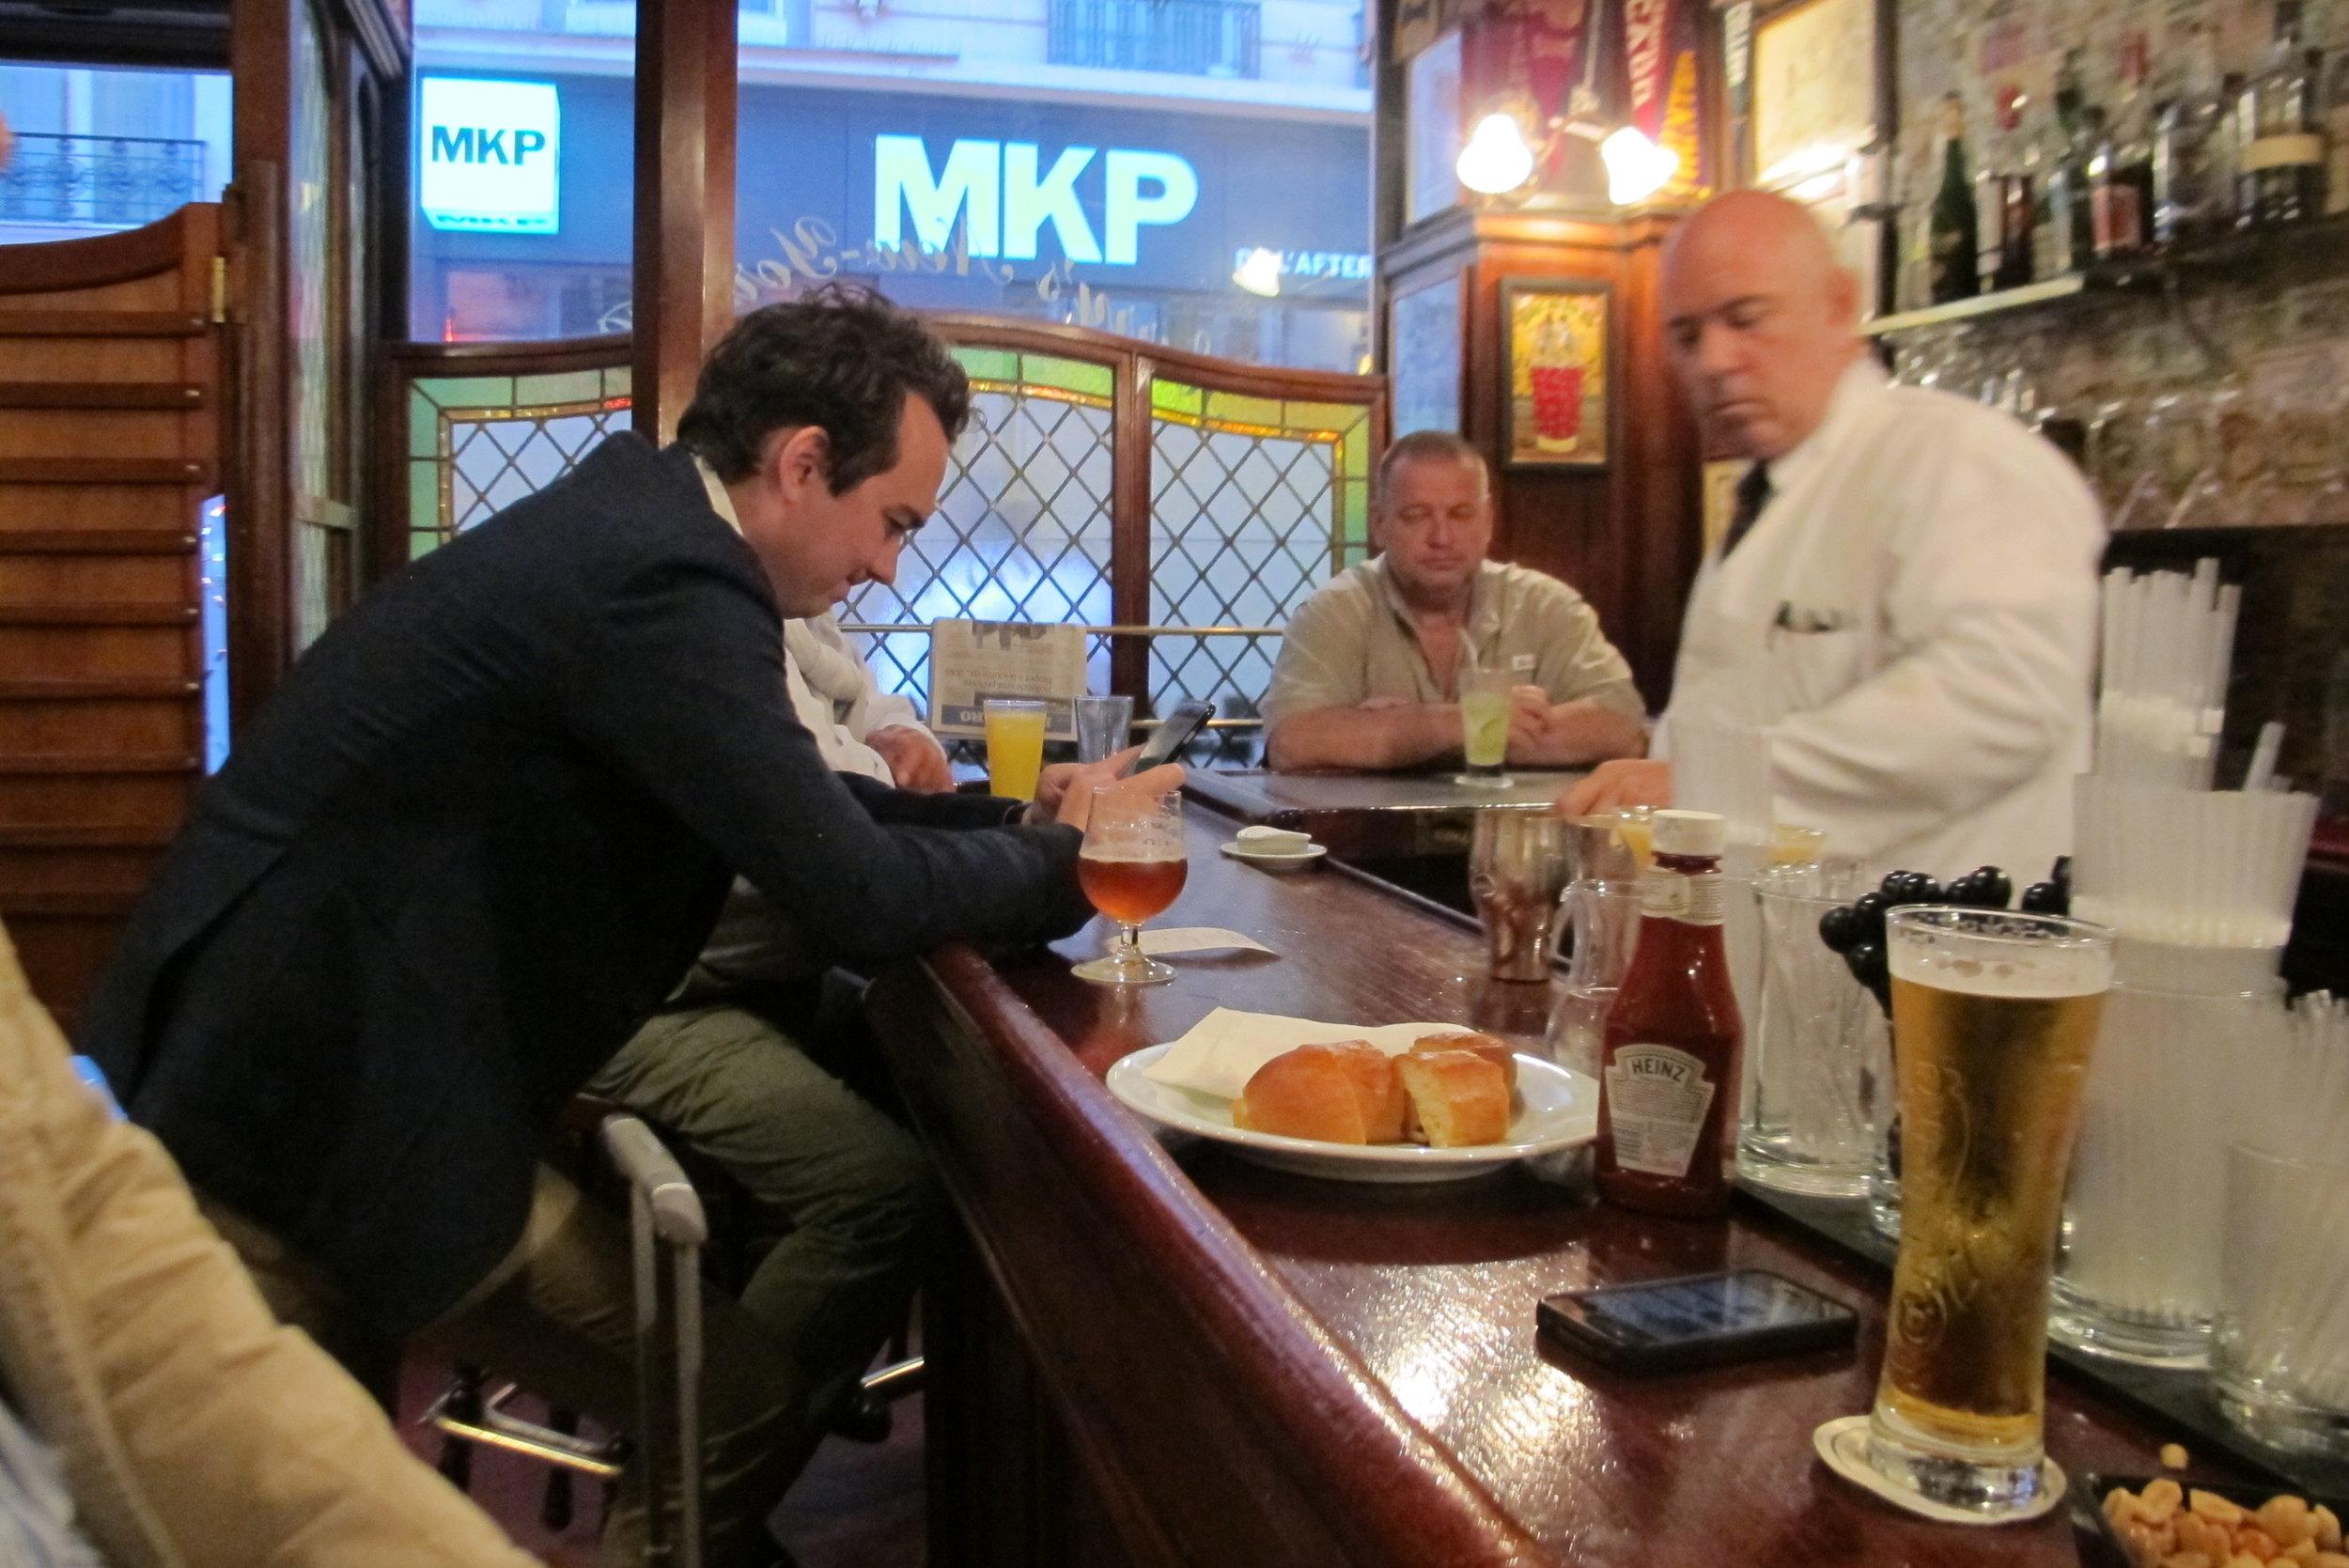 Guys being guys at Harry's New York Bar in Paris. Photo: Elizabeth Kemble.